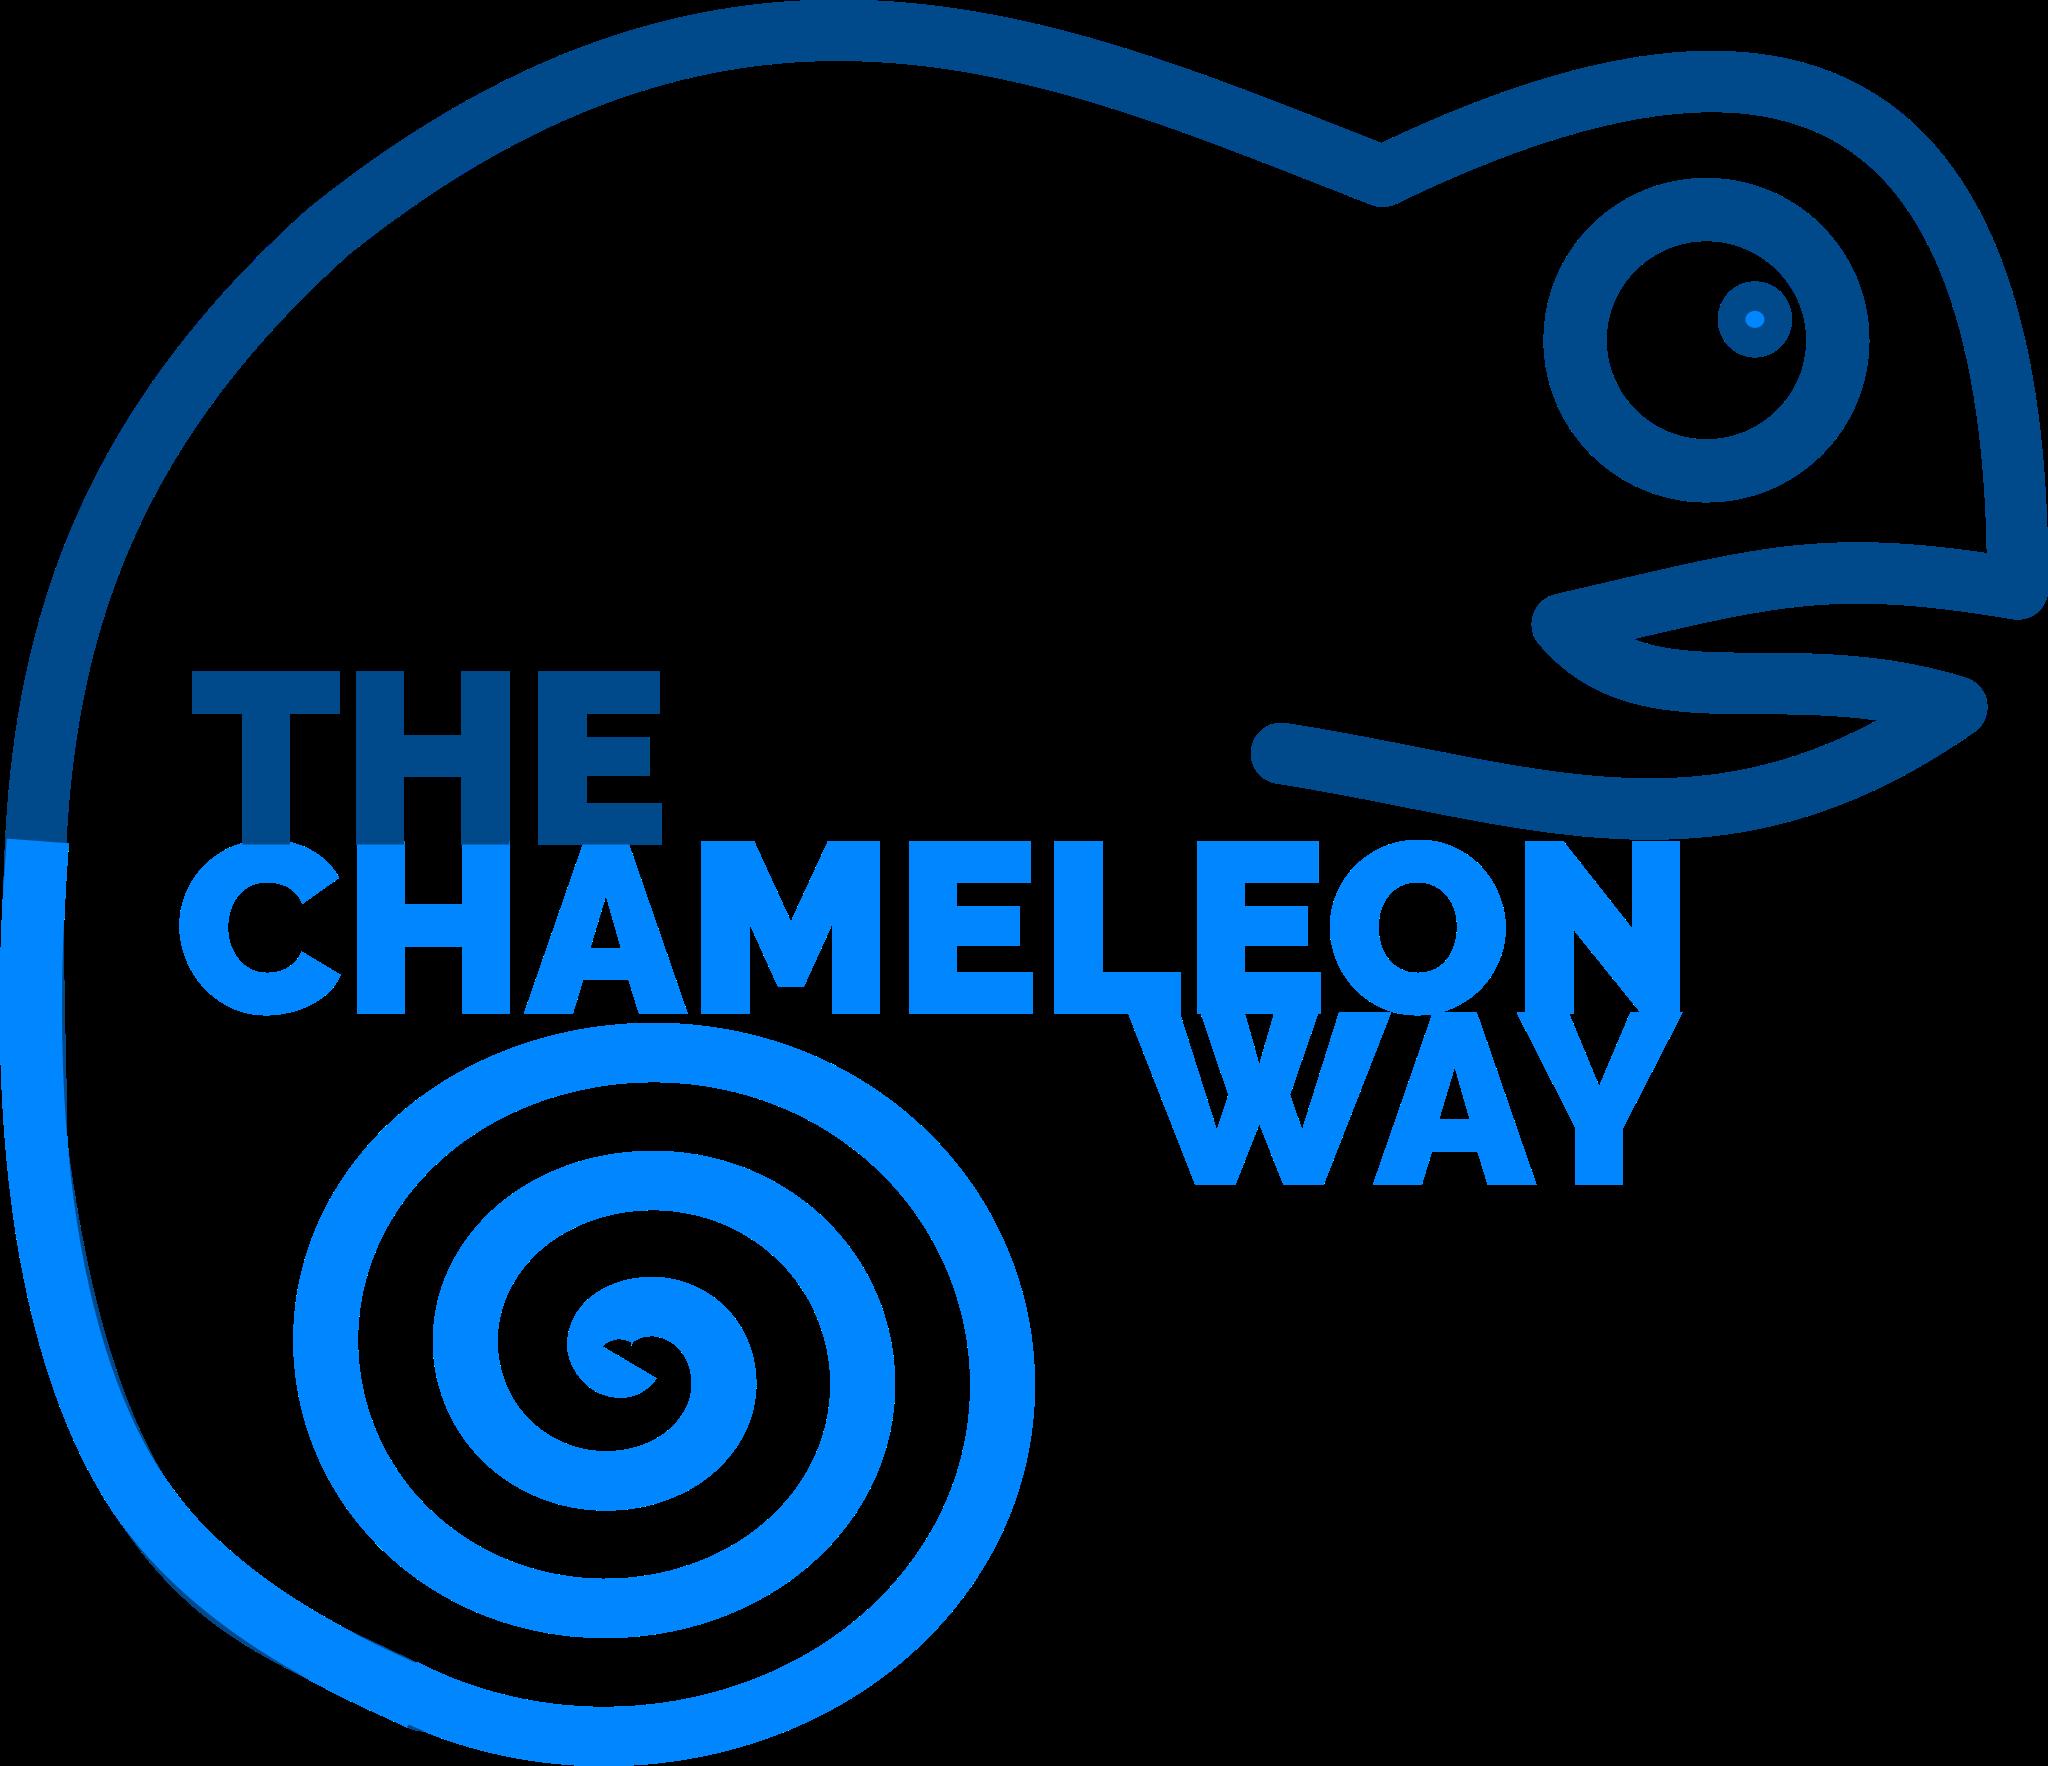 The Chameleon Way